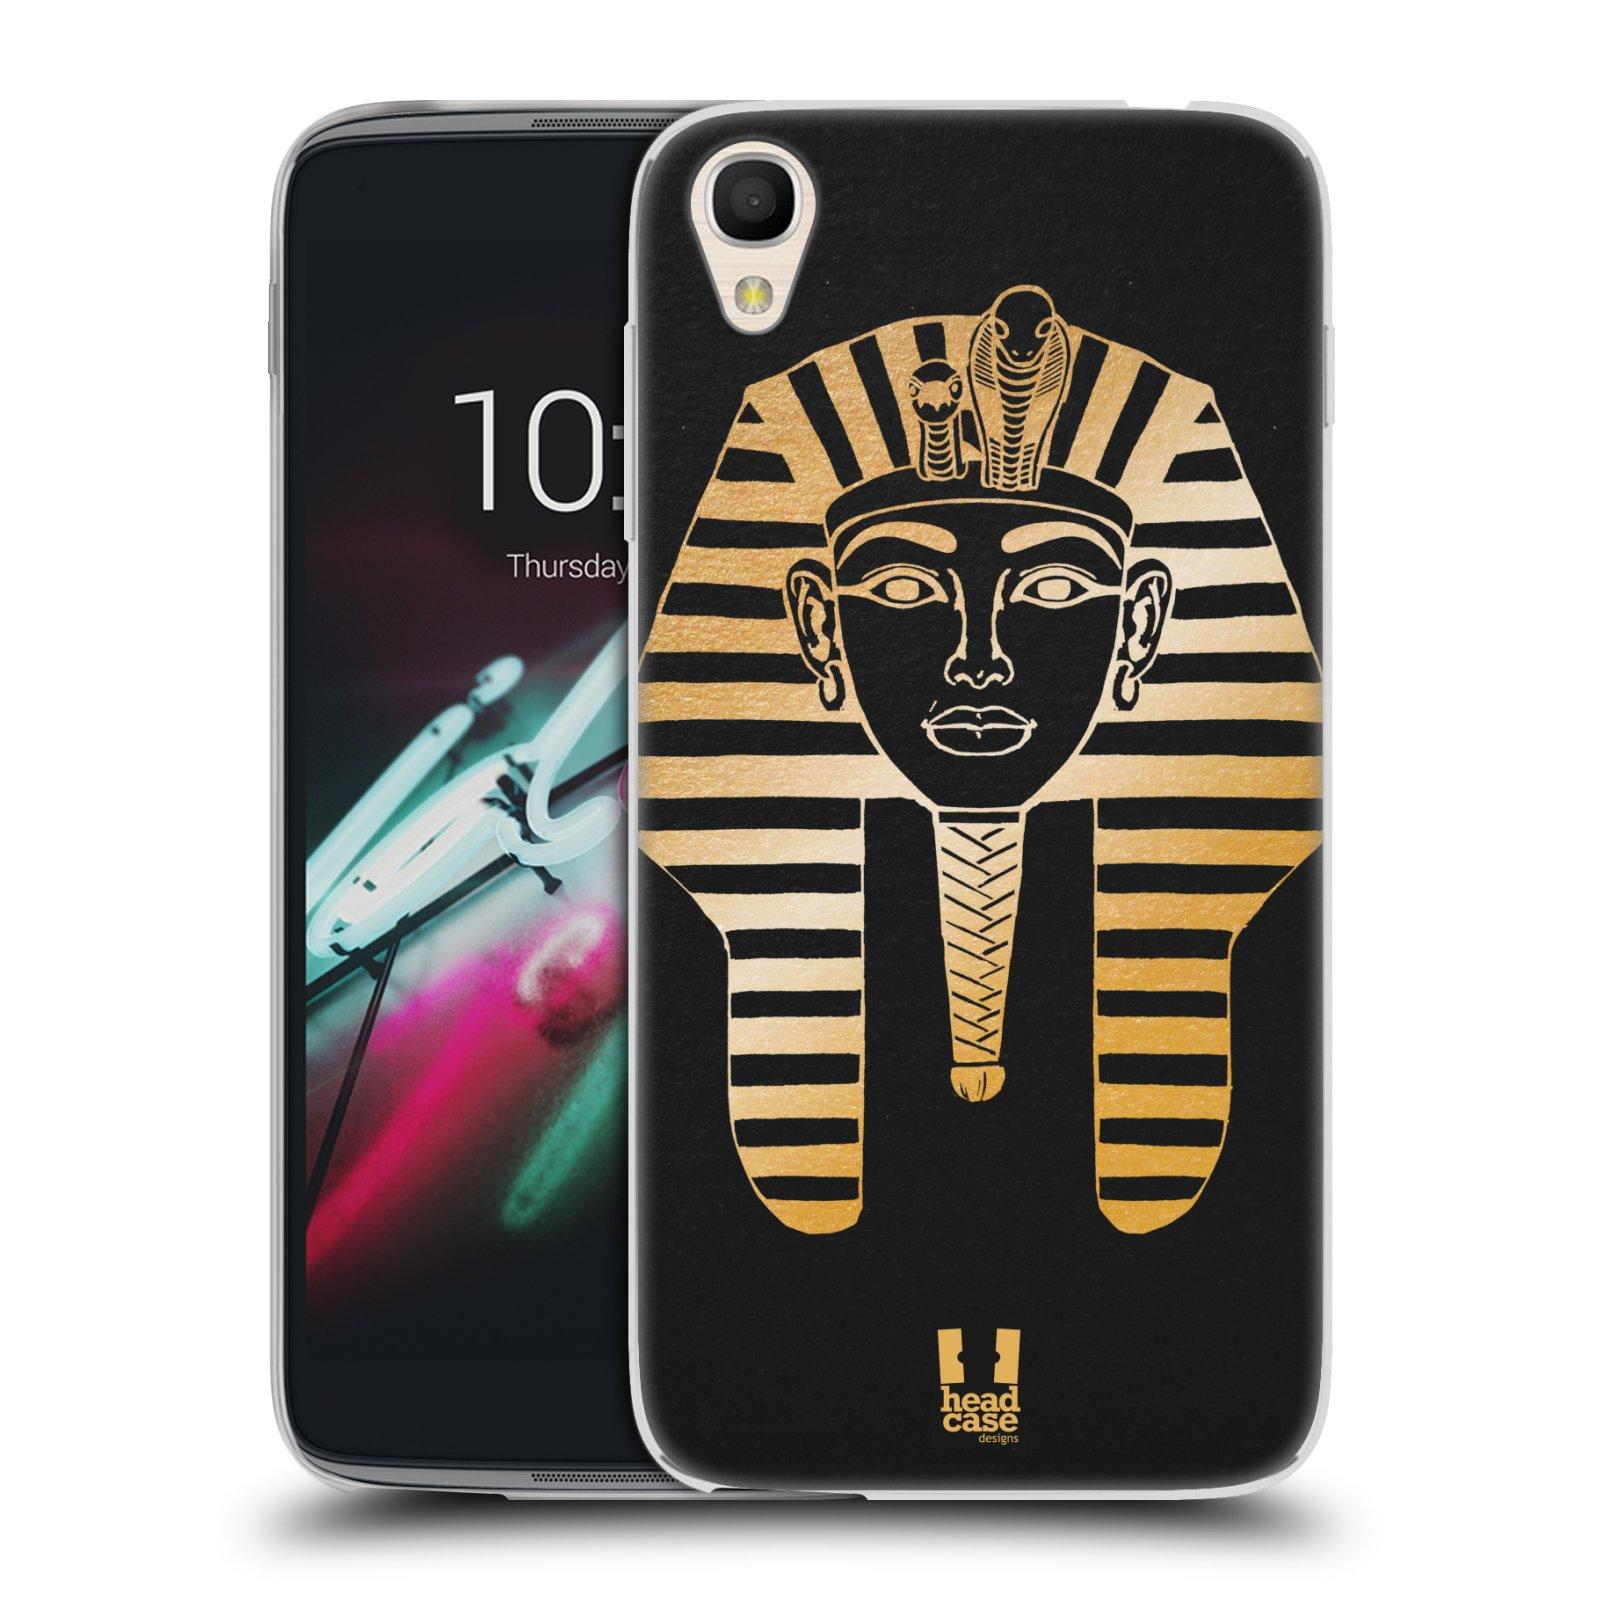 "Silikonové pouzdro na mobil Alcatel One Touch 6039Y Idol 3 HEAD CASE EGYPT FARAON (Silikonový kryt či obal na mobilní telefon Alcatel One Touch Idol 3 OT-6039Y s 4,7"" displejem)"